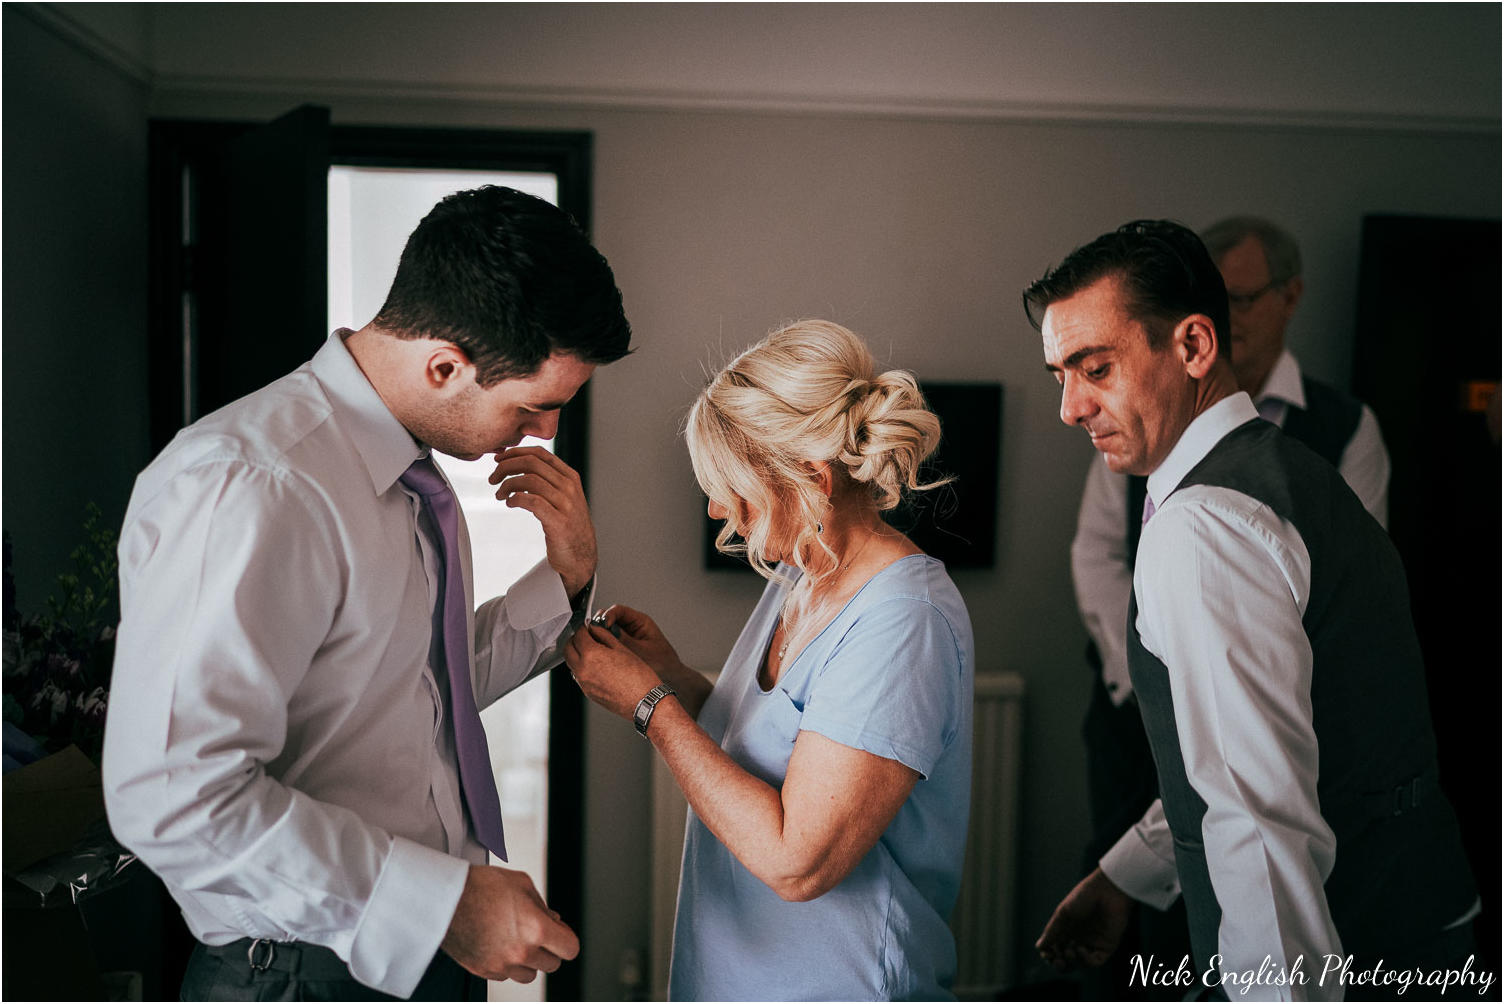 Mitton_Hall_Wedding_Photographer_2018-16.jpg